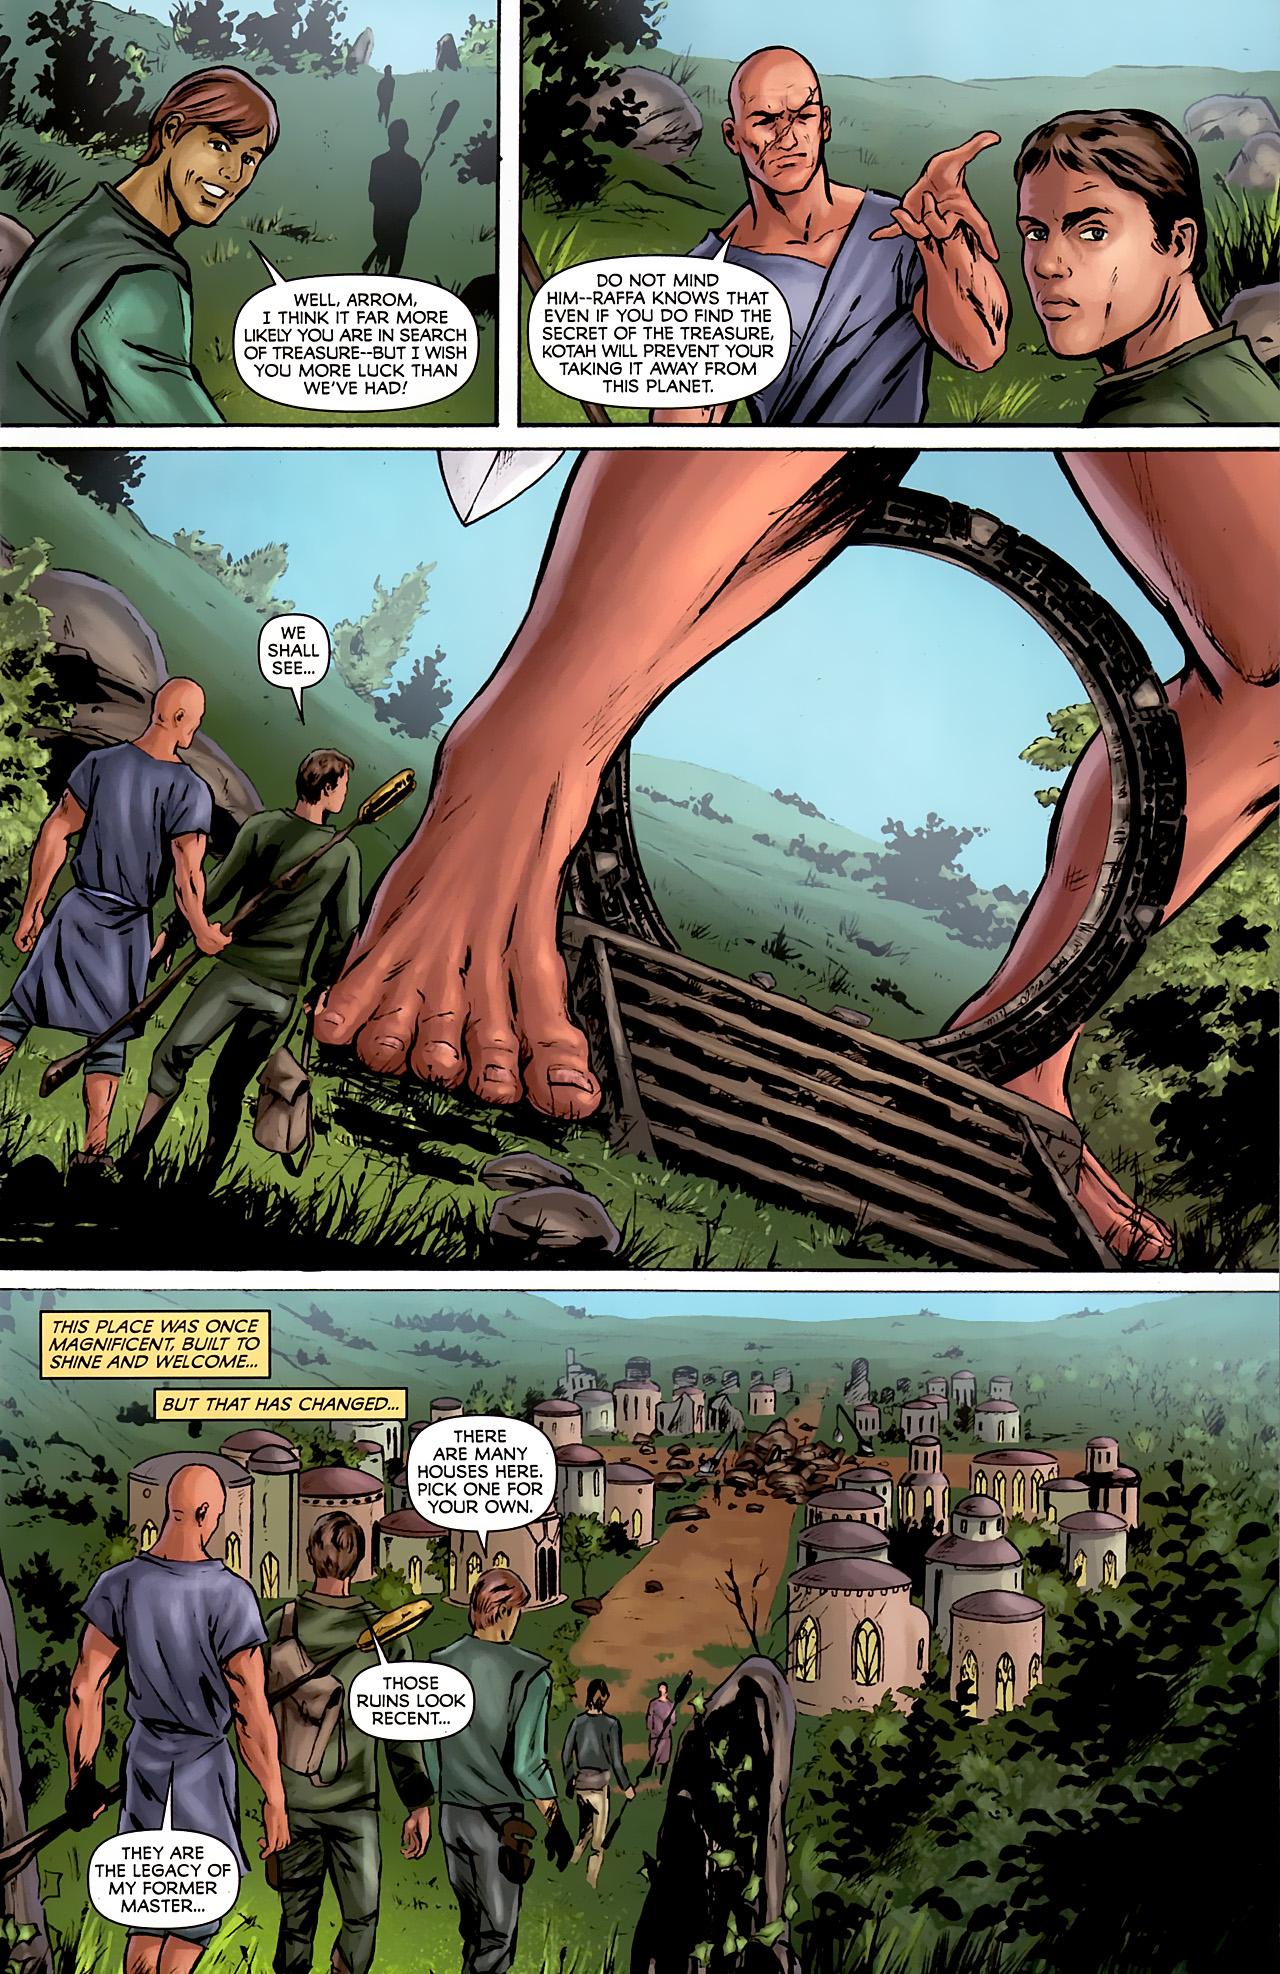 Read online Stargate: Daniel Jackson comic -  Issue #2 - 5